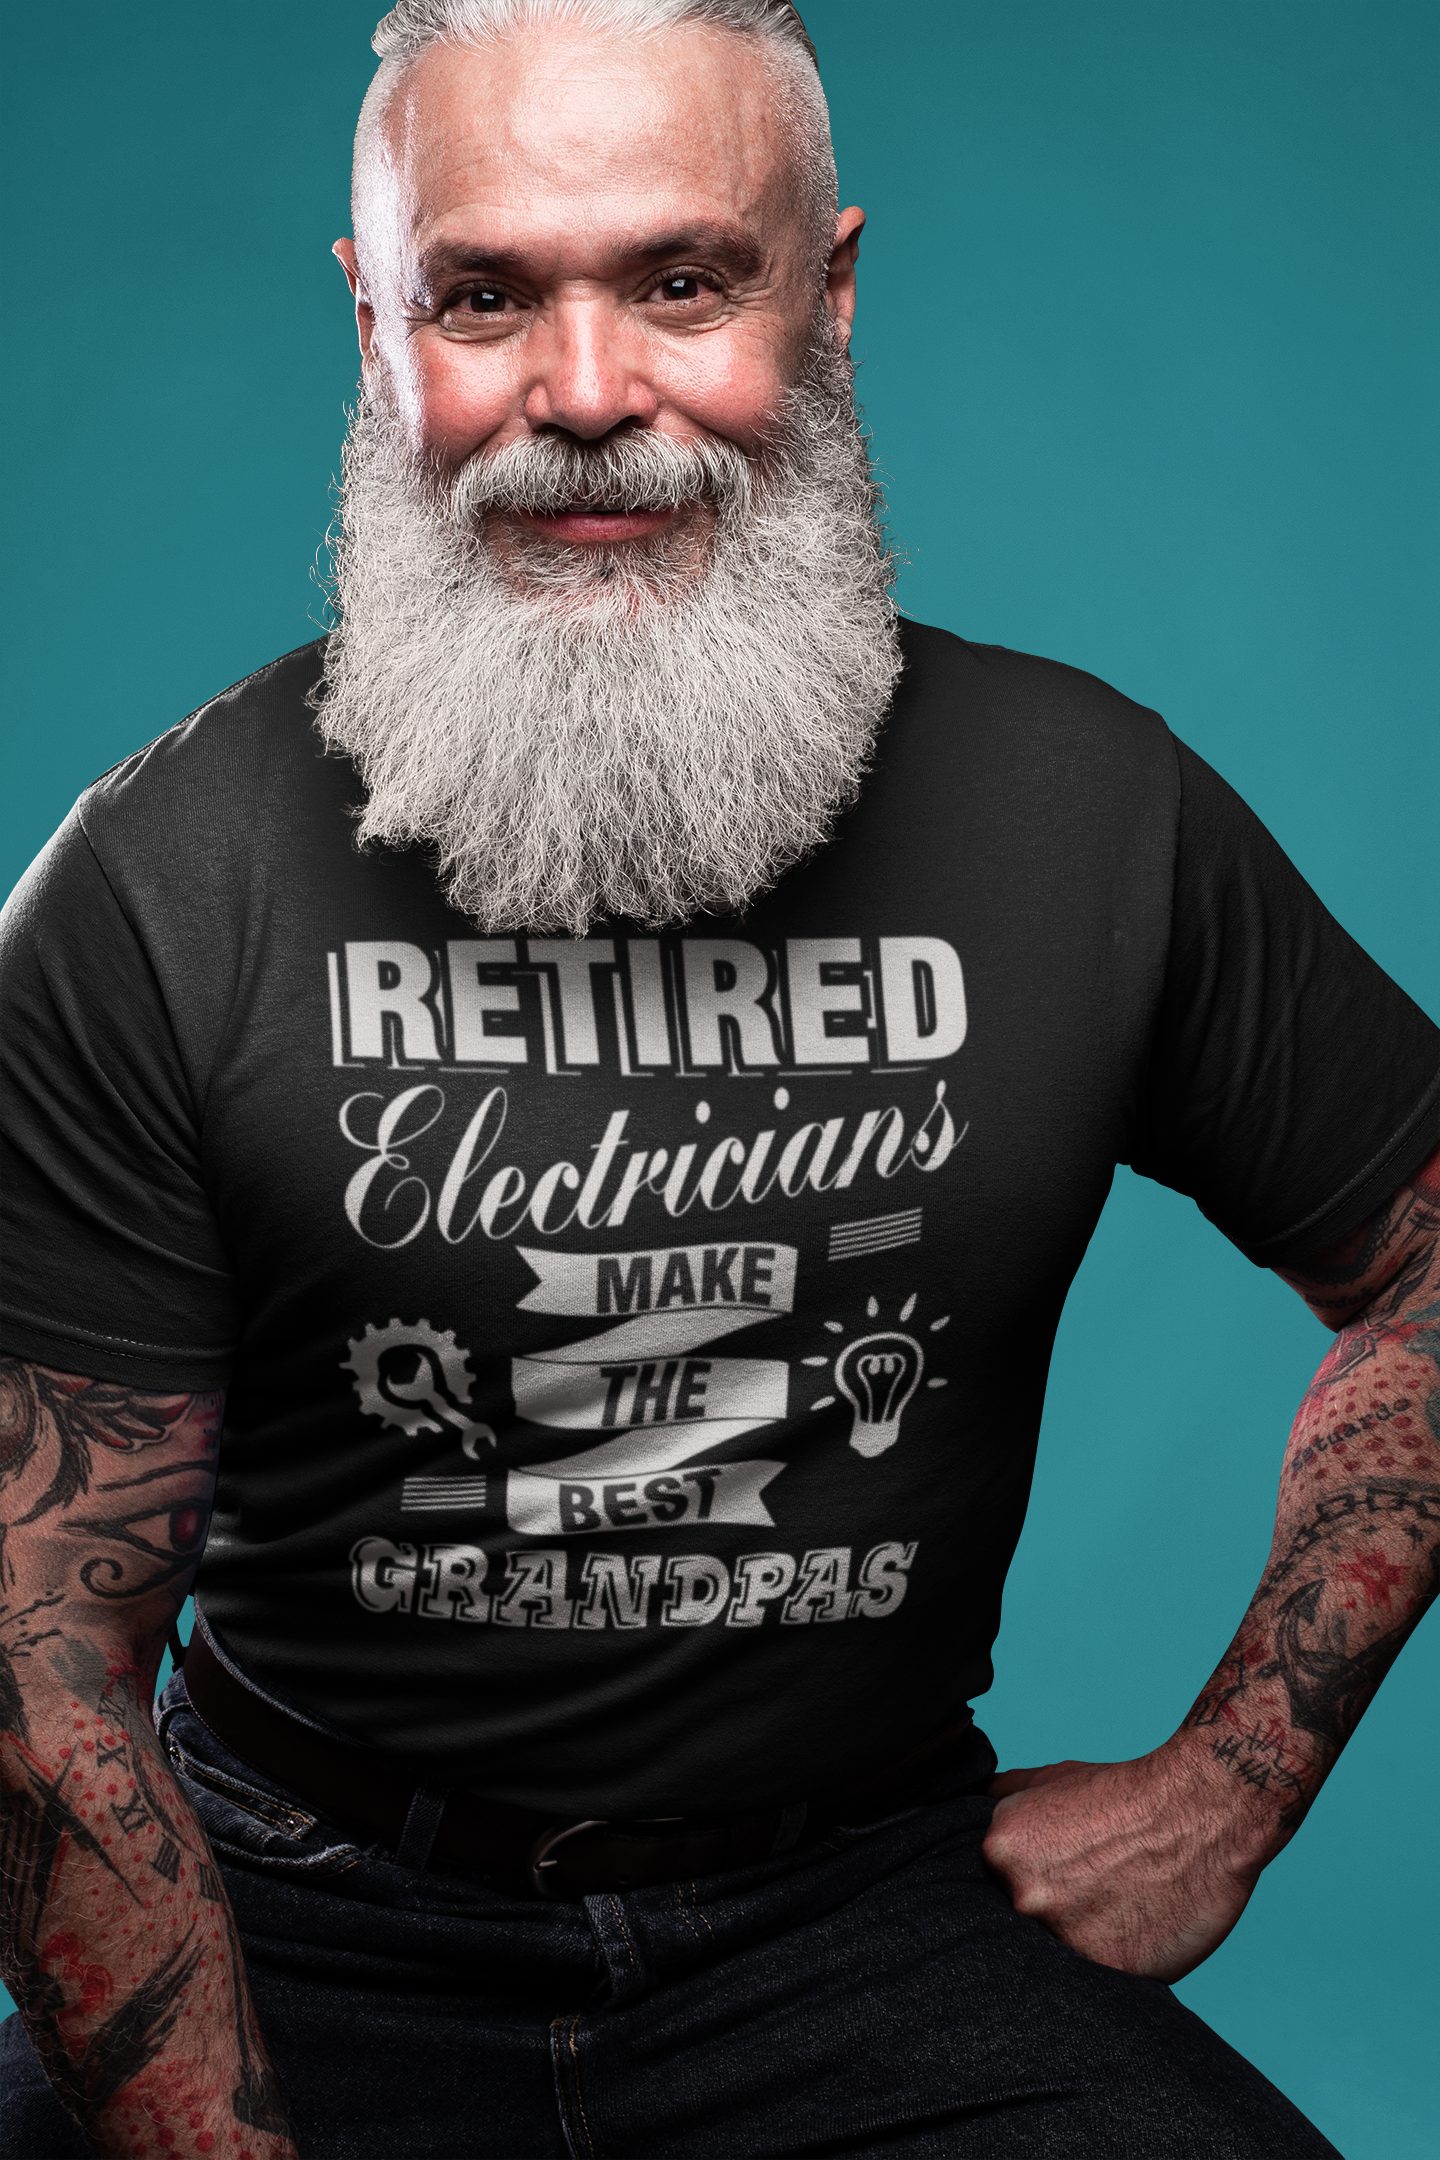 t-shirt-mockup-of-a-senior-man-with-a-big-beard-23383.png